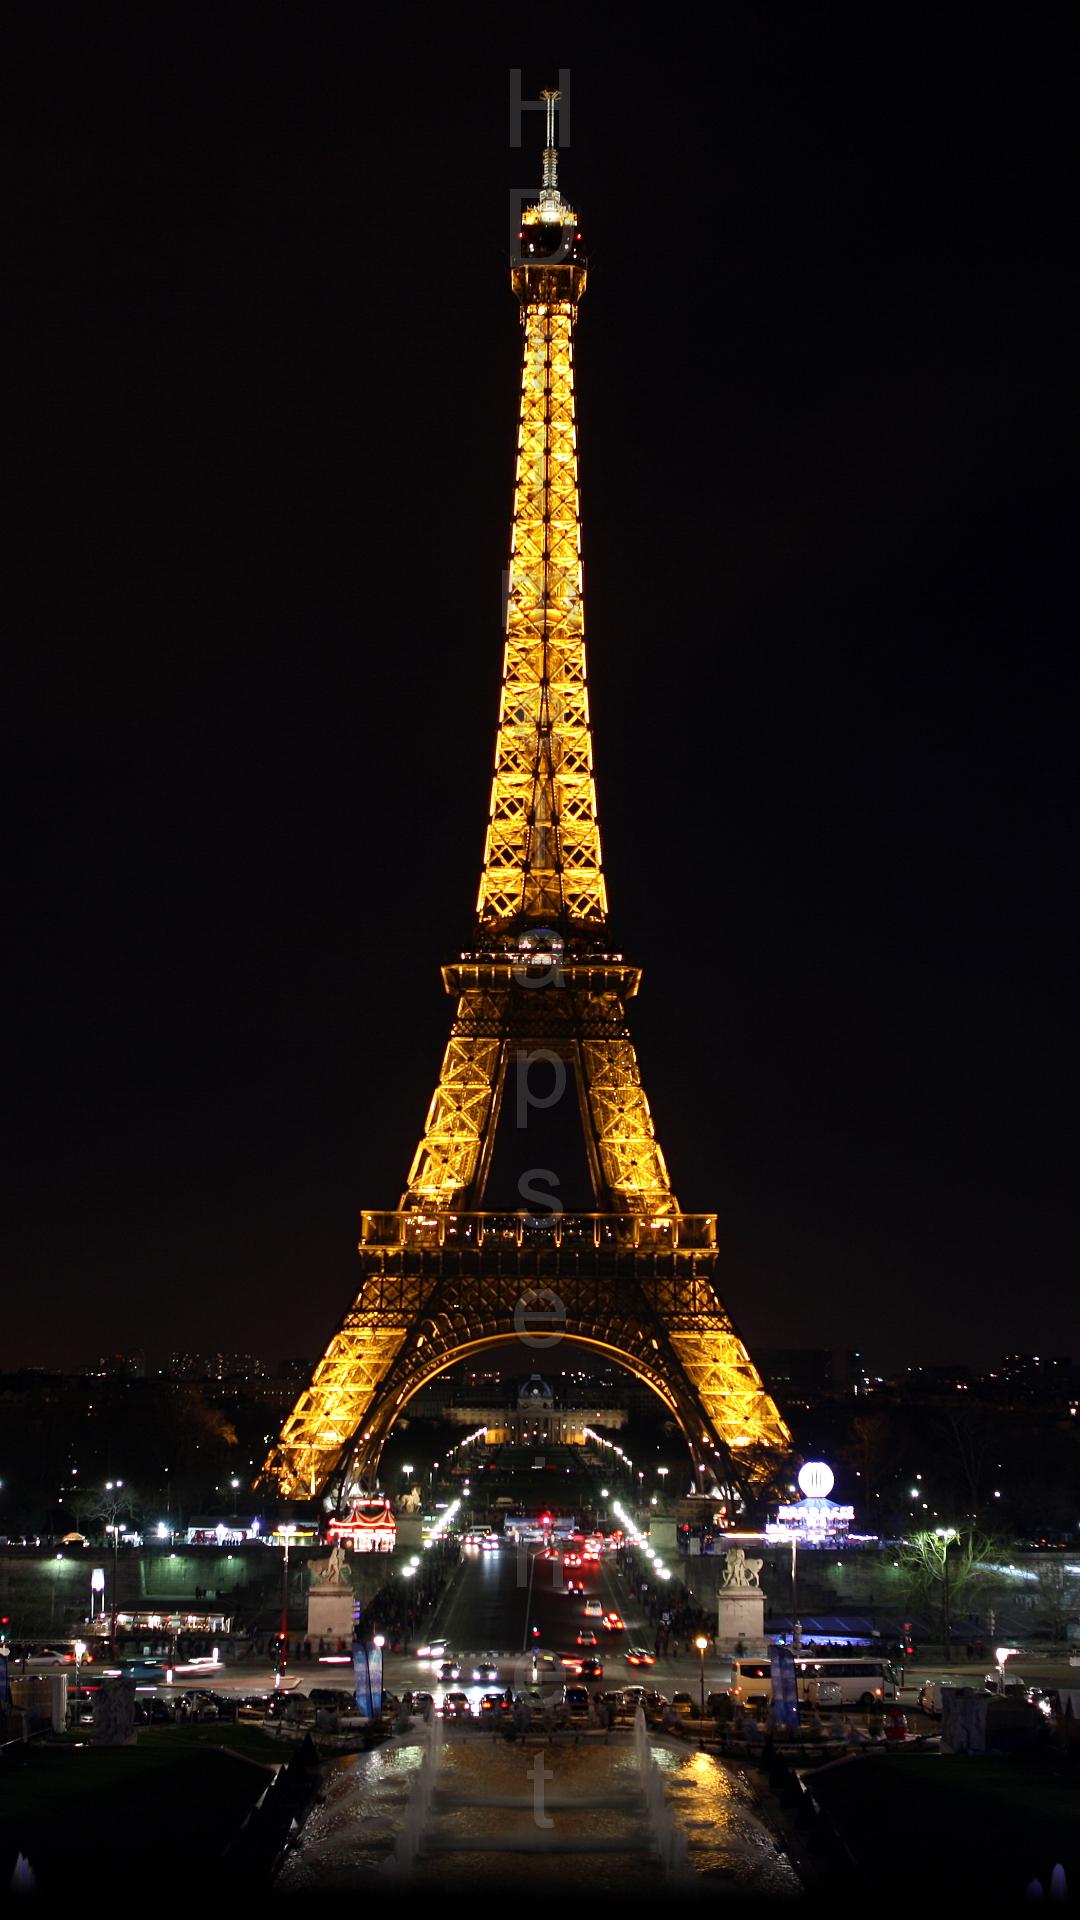 Hd wallpaper vertical - Ultra Hd 4k Video Time Lapse Stock Footage Eiffel Tower In Paris